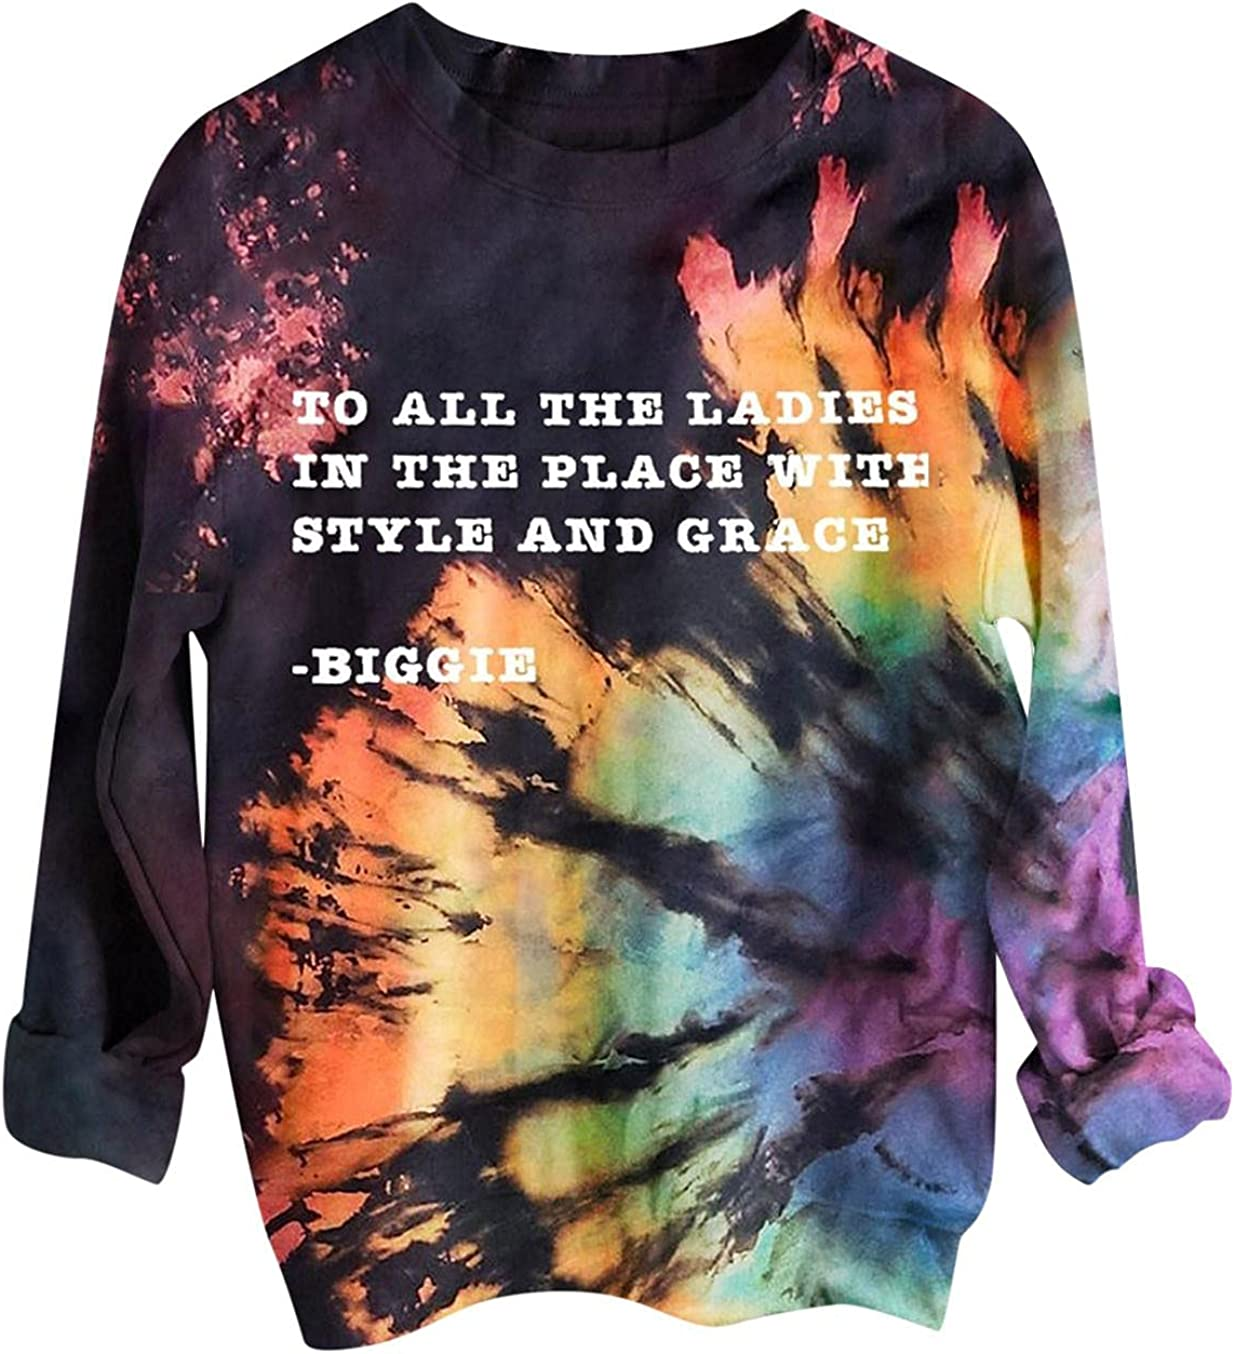 Halloween Sweatshirt for Women Shirts Reverse Autumn Tie Dye Rainbow Tops Long-Sleeved Sweater Basic Hoodies